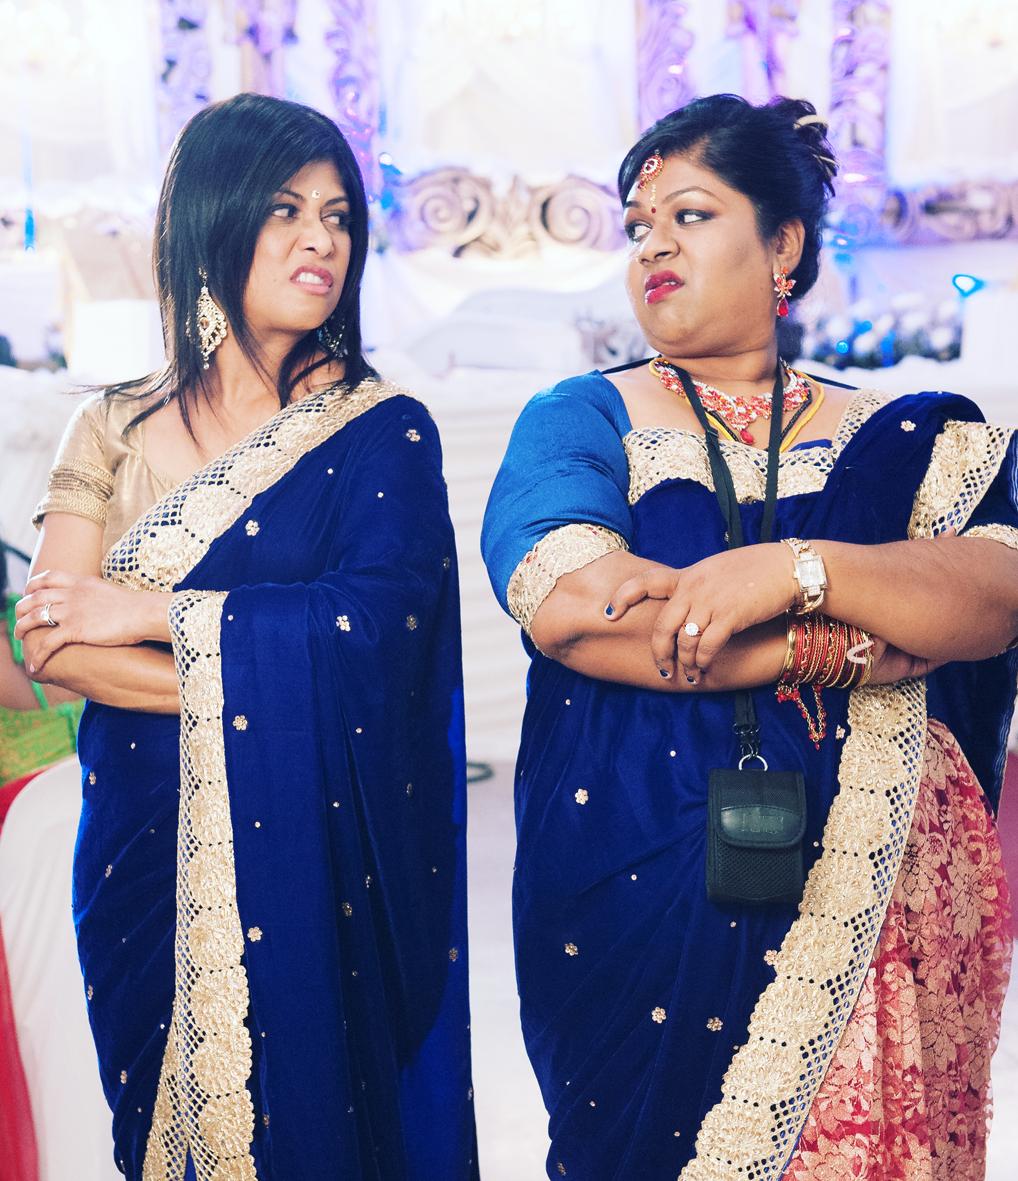 Keeping Up With The Kandasamys 2017 Imdb